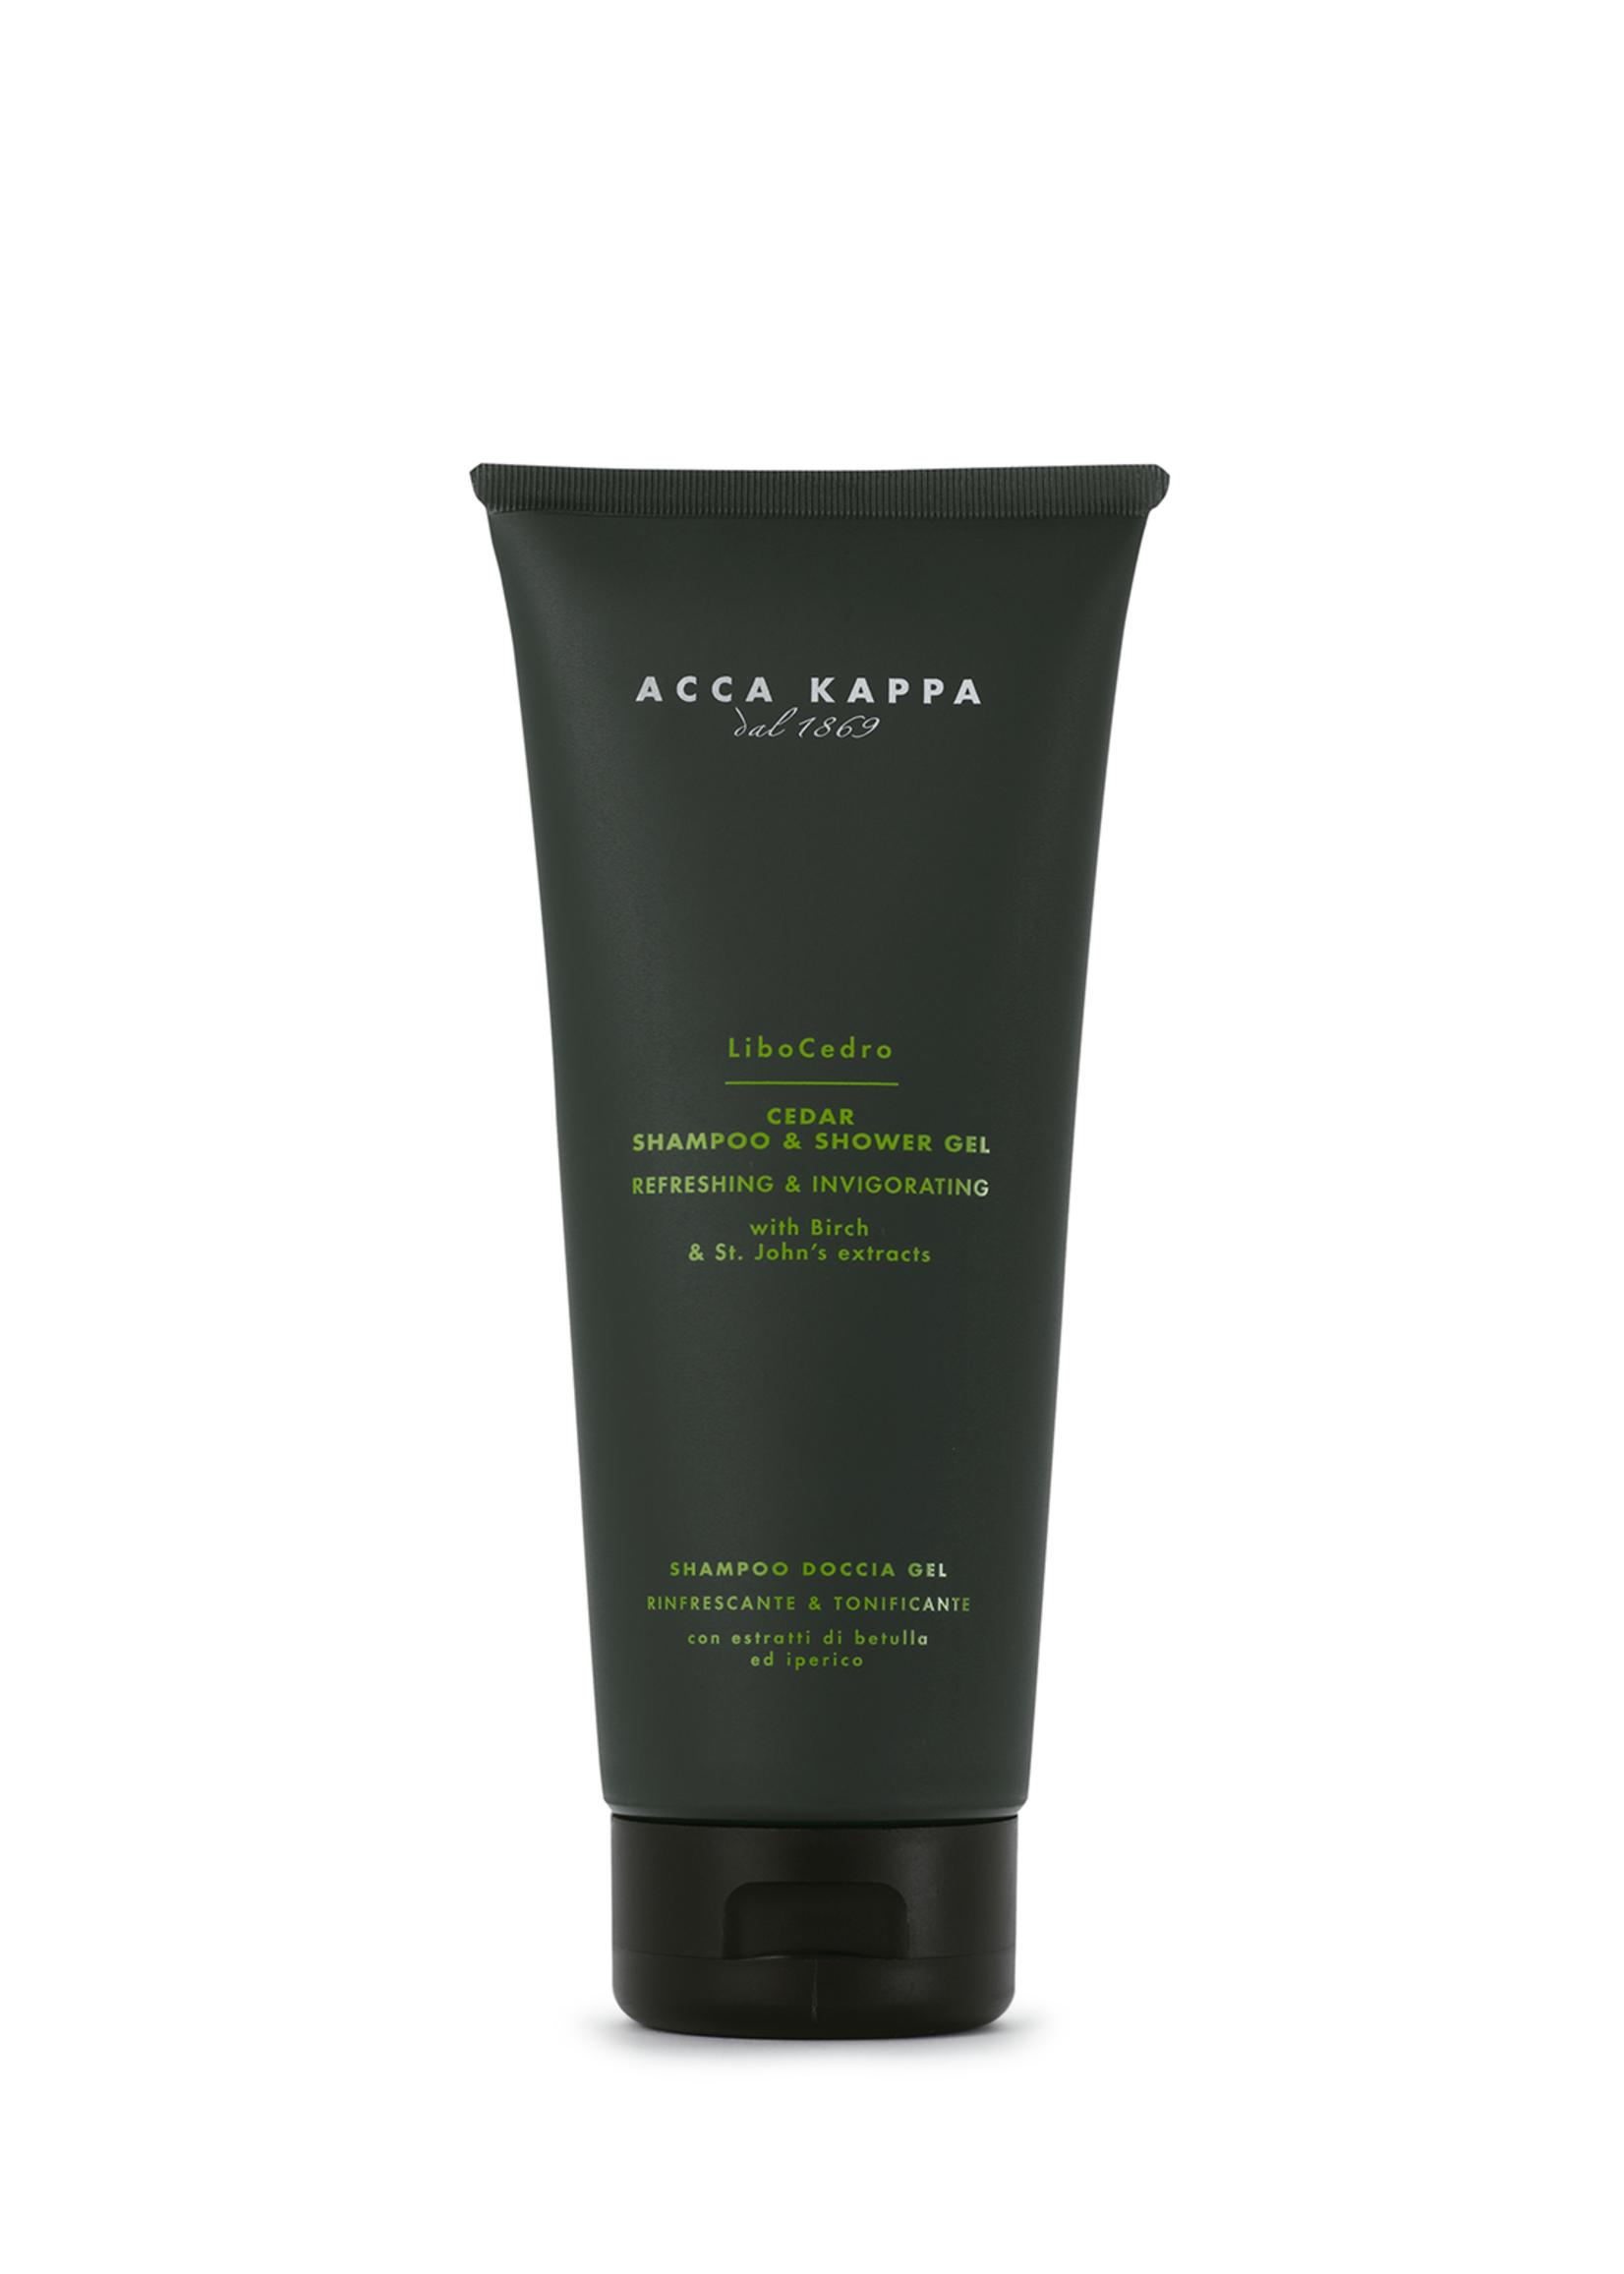 Acca Kappa Acca Kappa Cedar Shampoo & Shower Gel